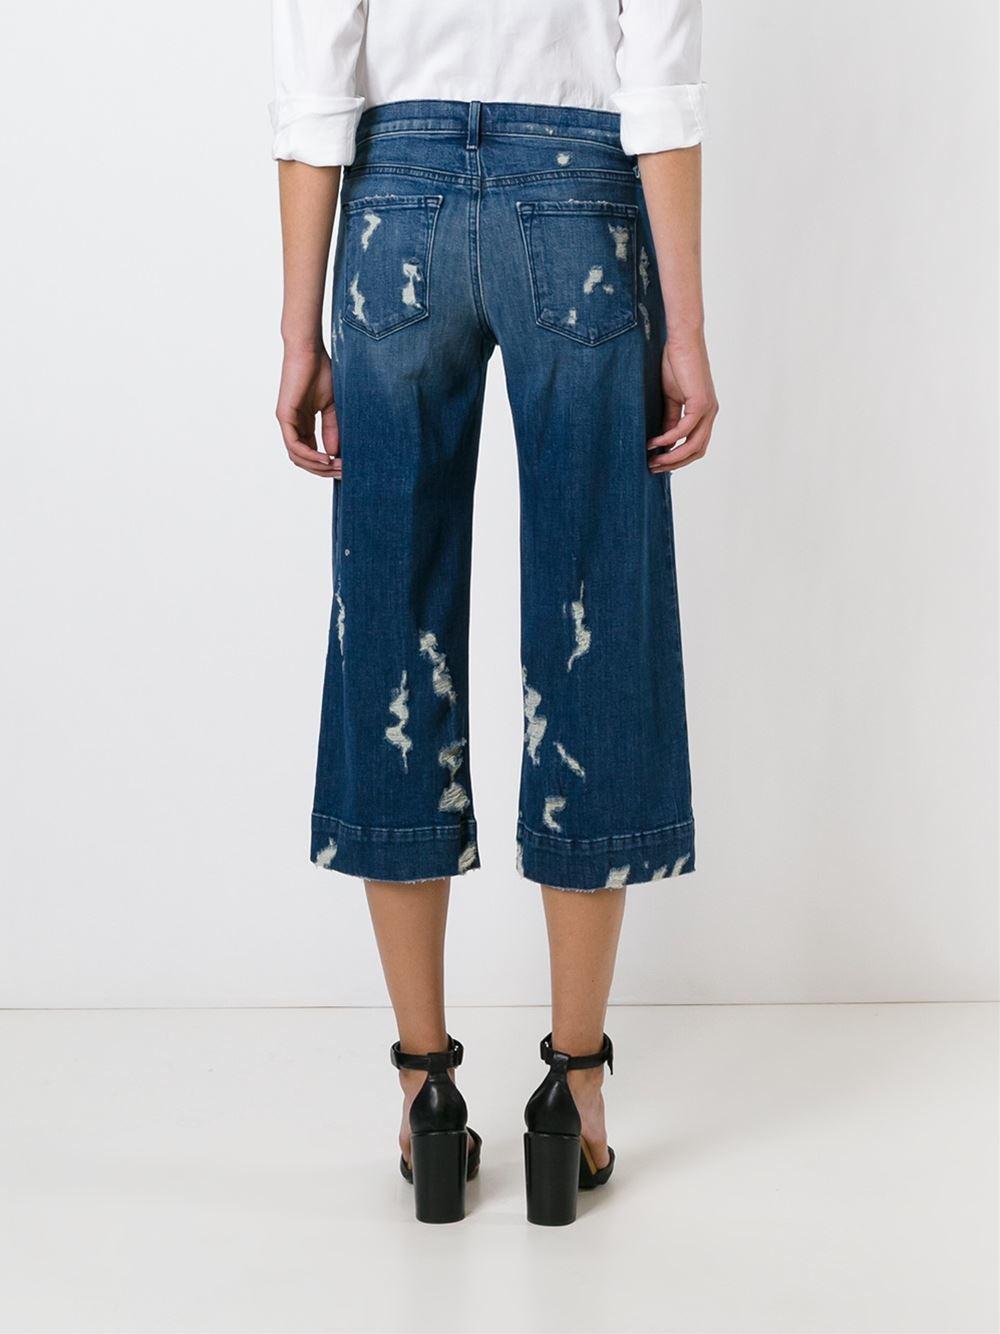 j brand 39 liza 39 denim culottes women cotton spandex elastane 28 in blue lyst. Black Bedroom Furniture Sets. Home Design Ideas